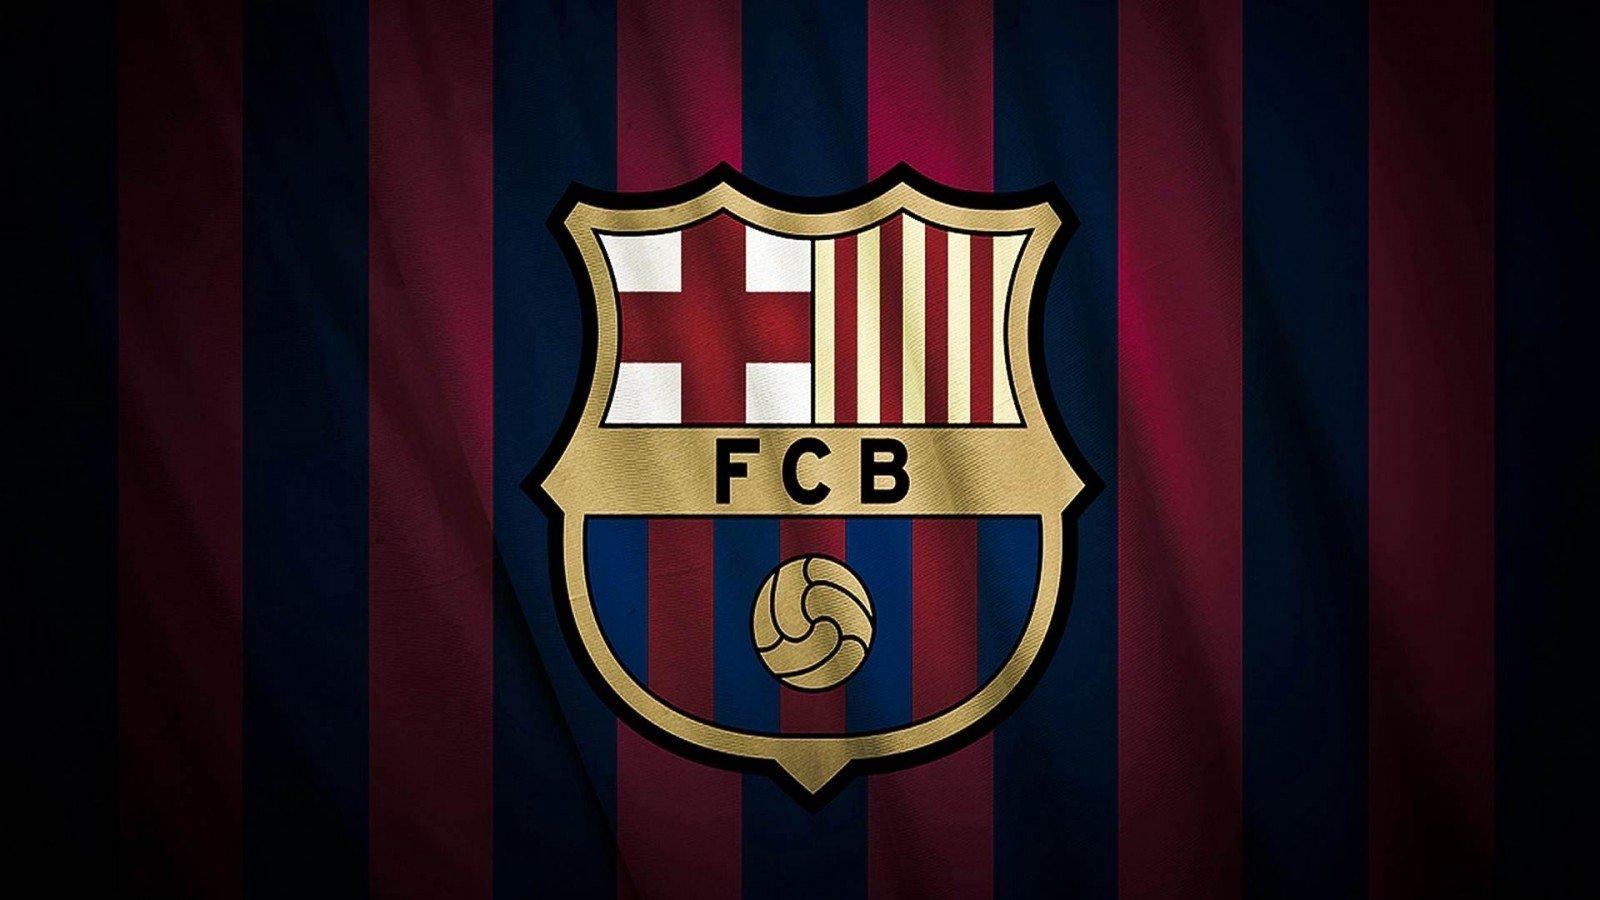 Fc Barcelona Logo Football Hd Soccer Wallpaper Full HD Wallpapers 1600x900